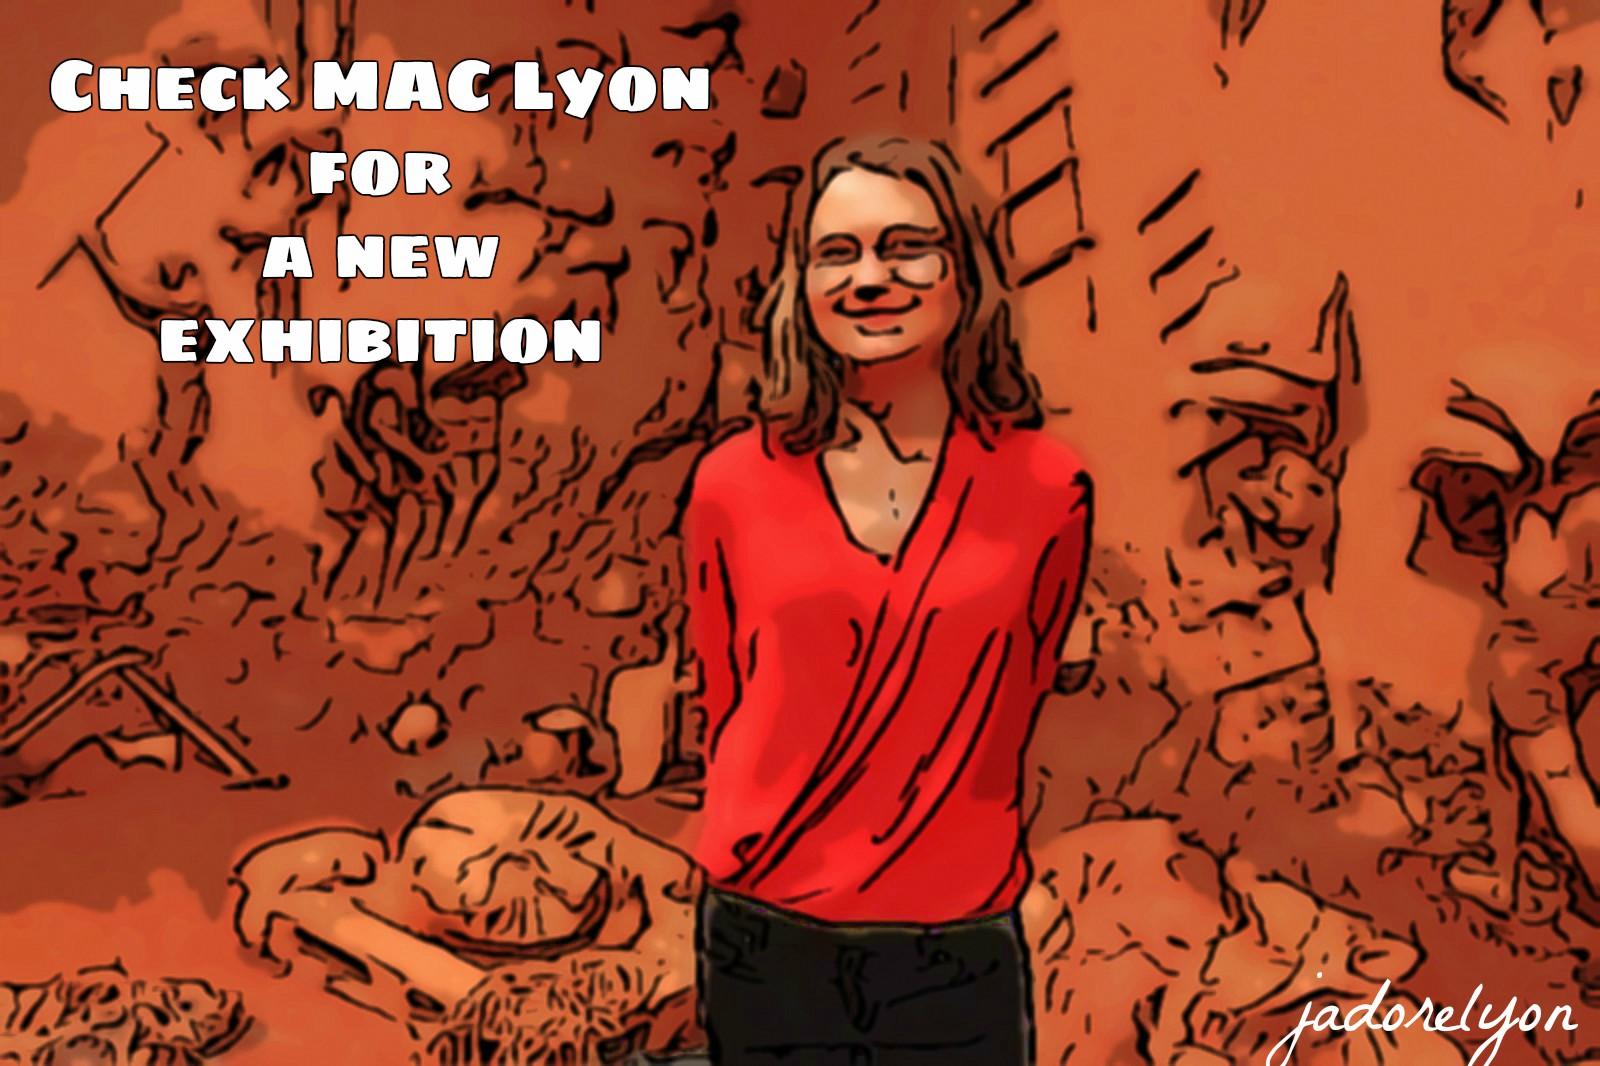 Check MAC Lyon - Musée d'art contemporain de Lyon for a new exhibition